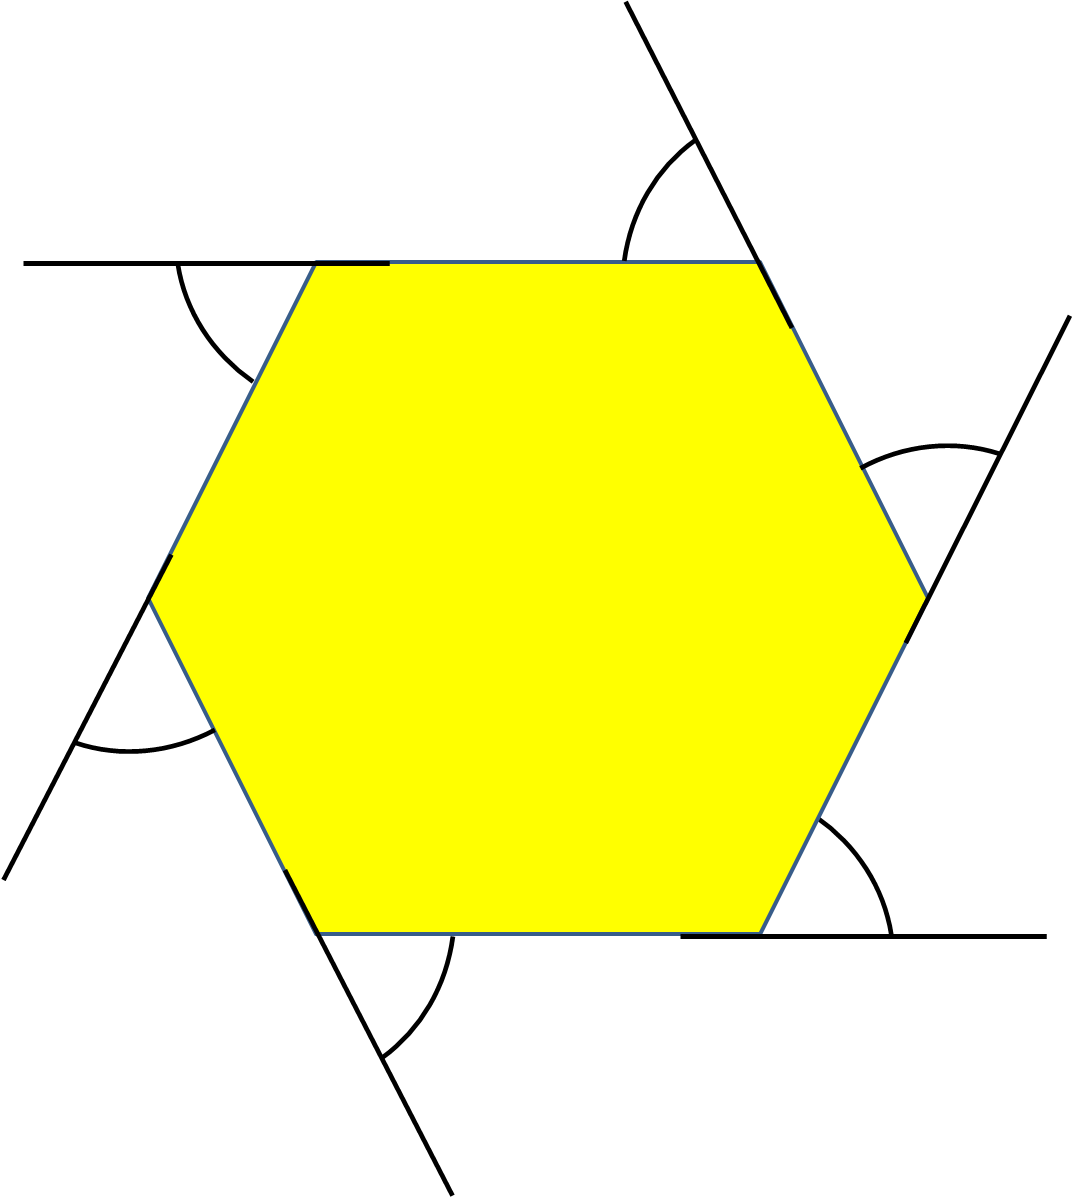 Exterior Angles Of Regular Polygons